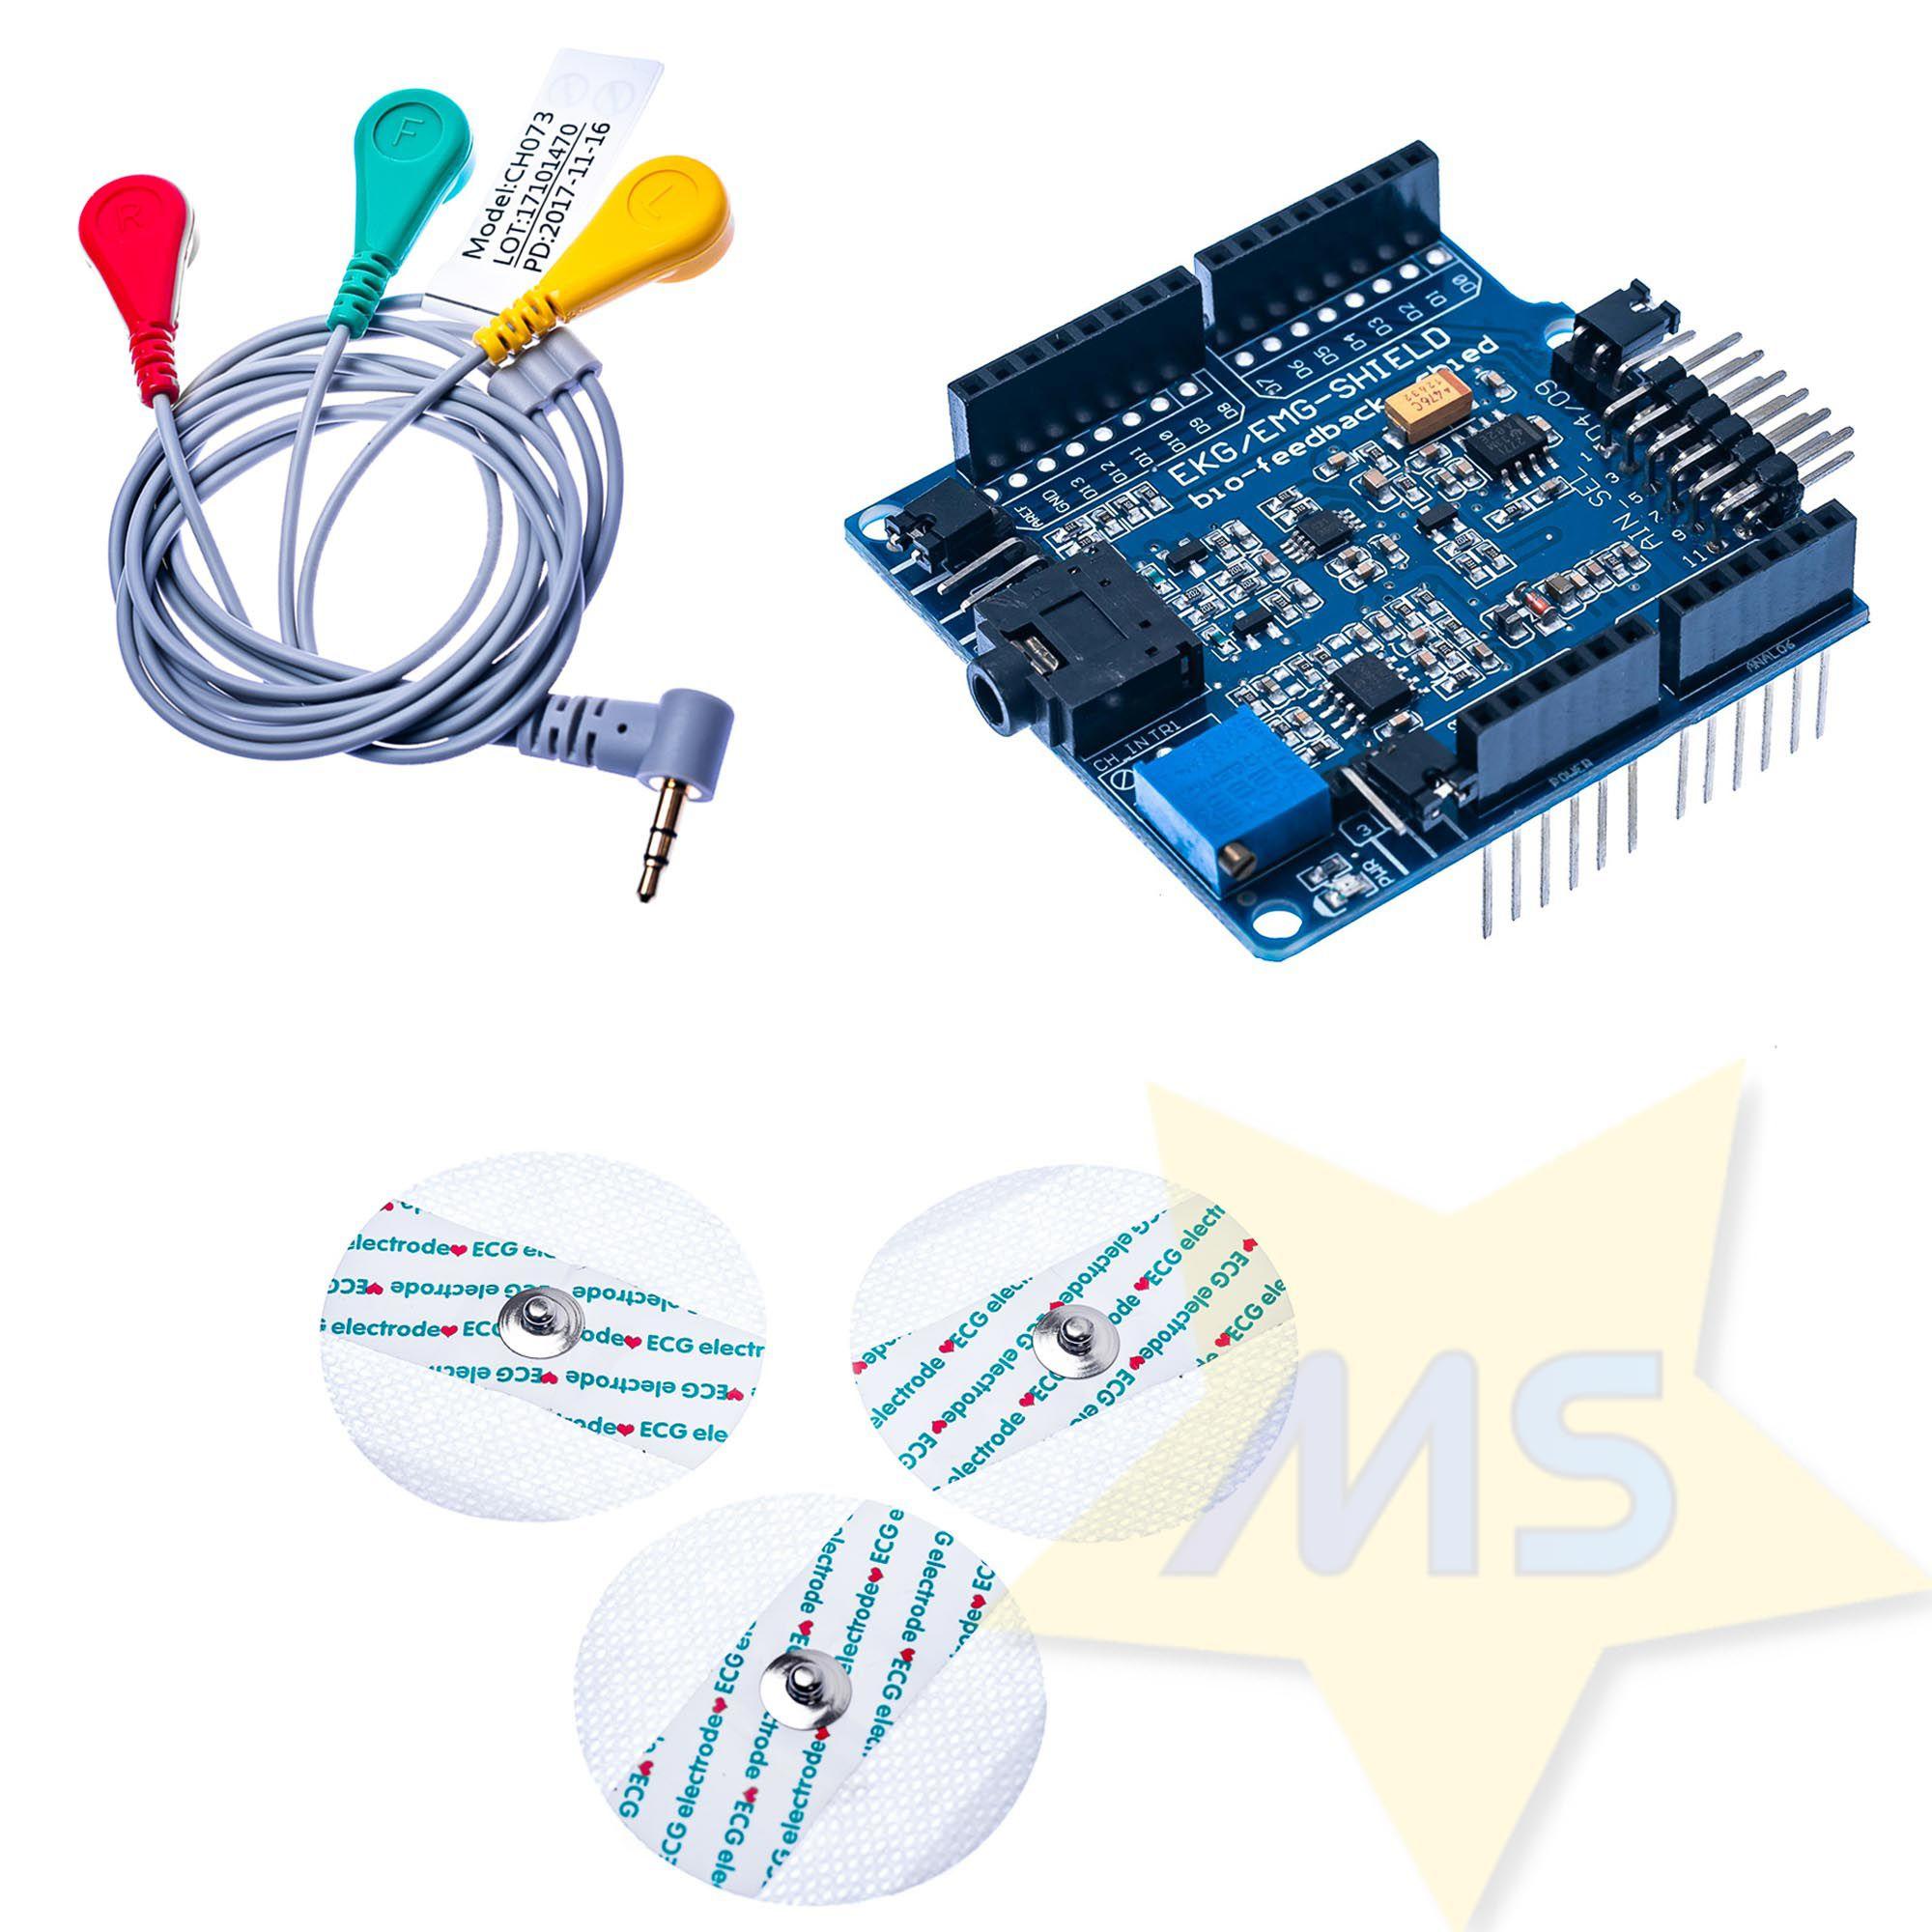 ECG-EMG Arduino Shield (Bio-feedback Sensor)